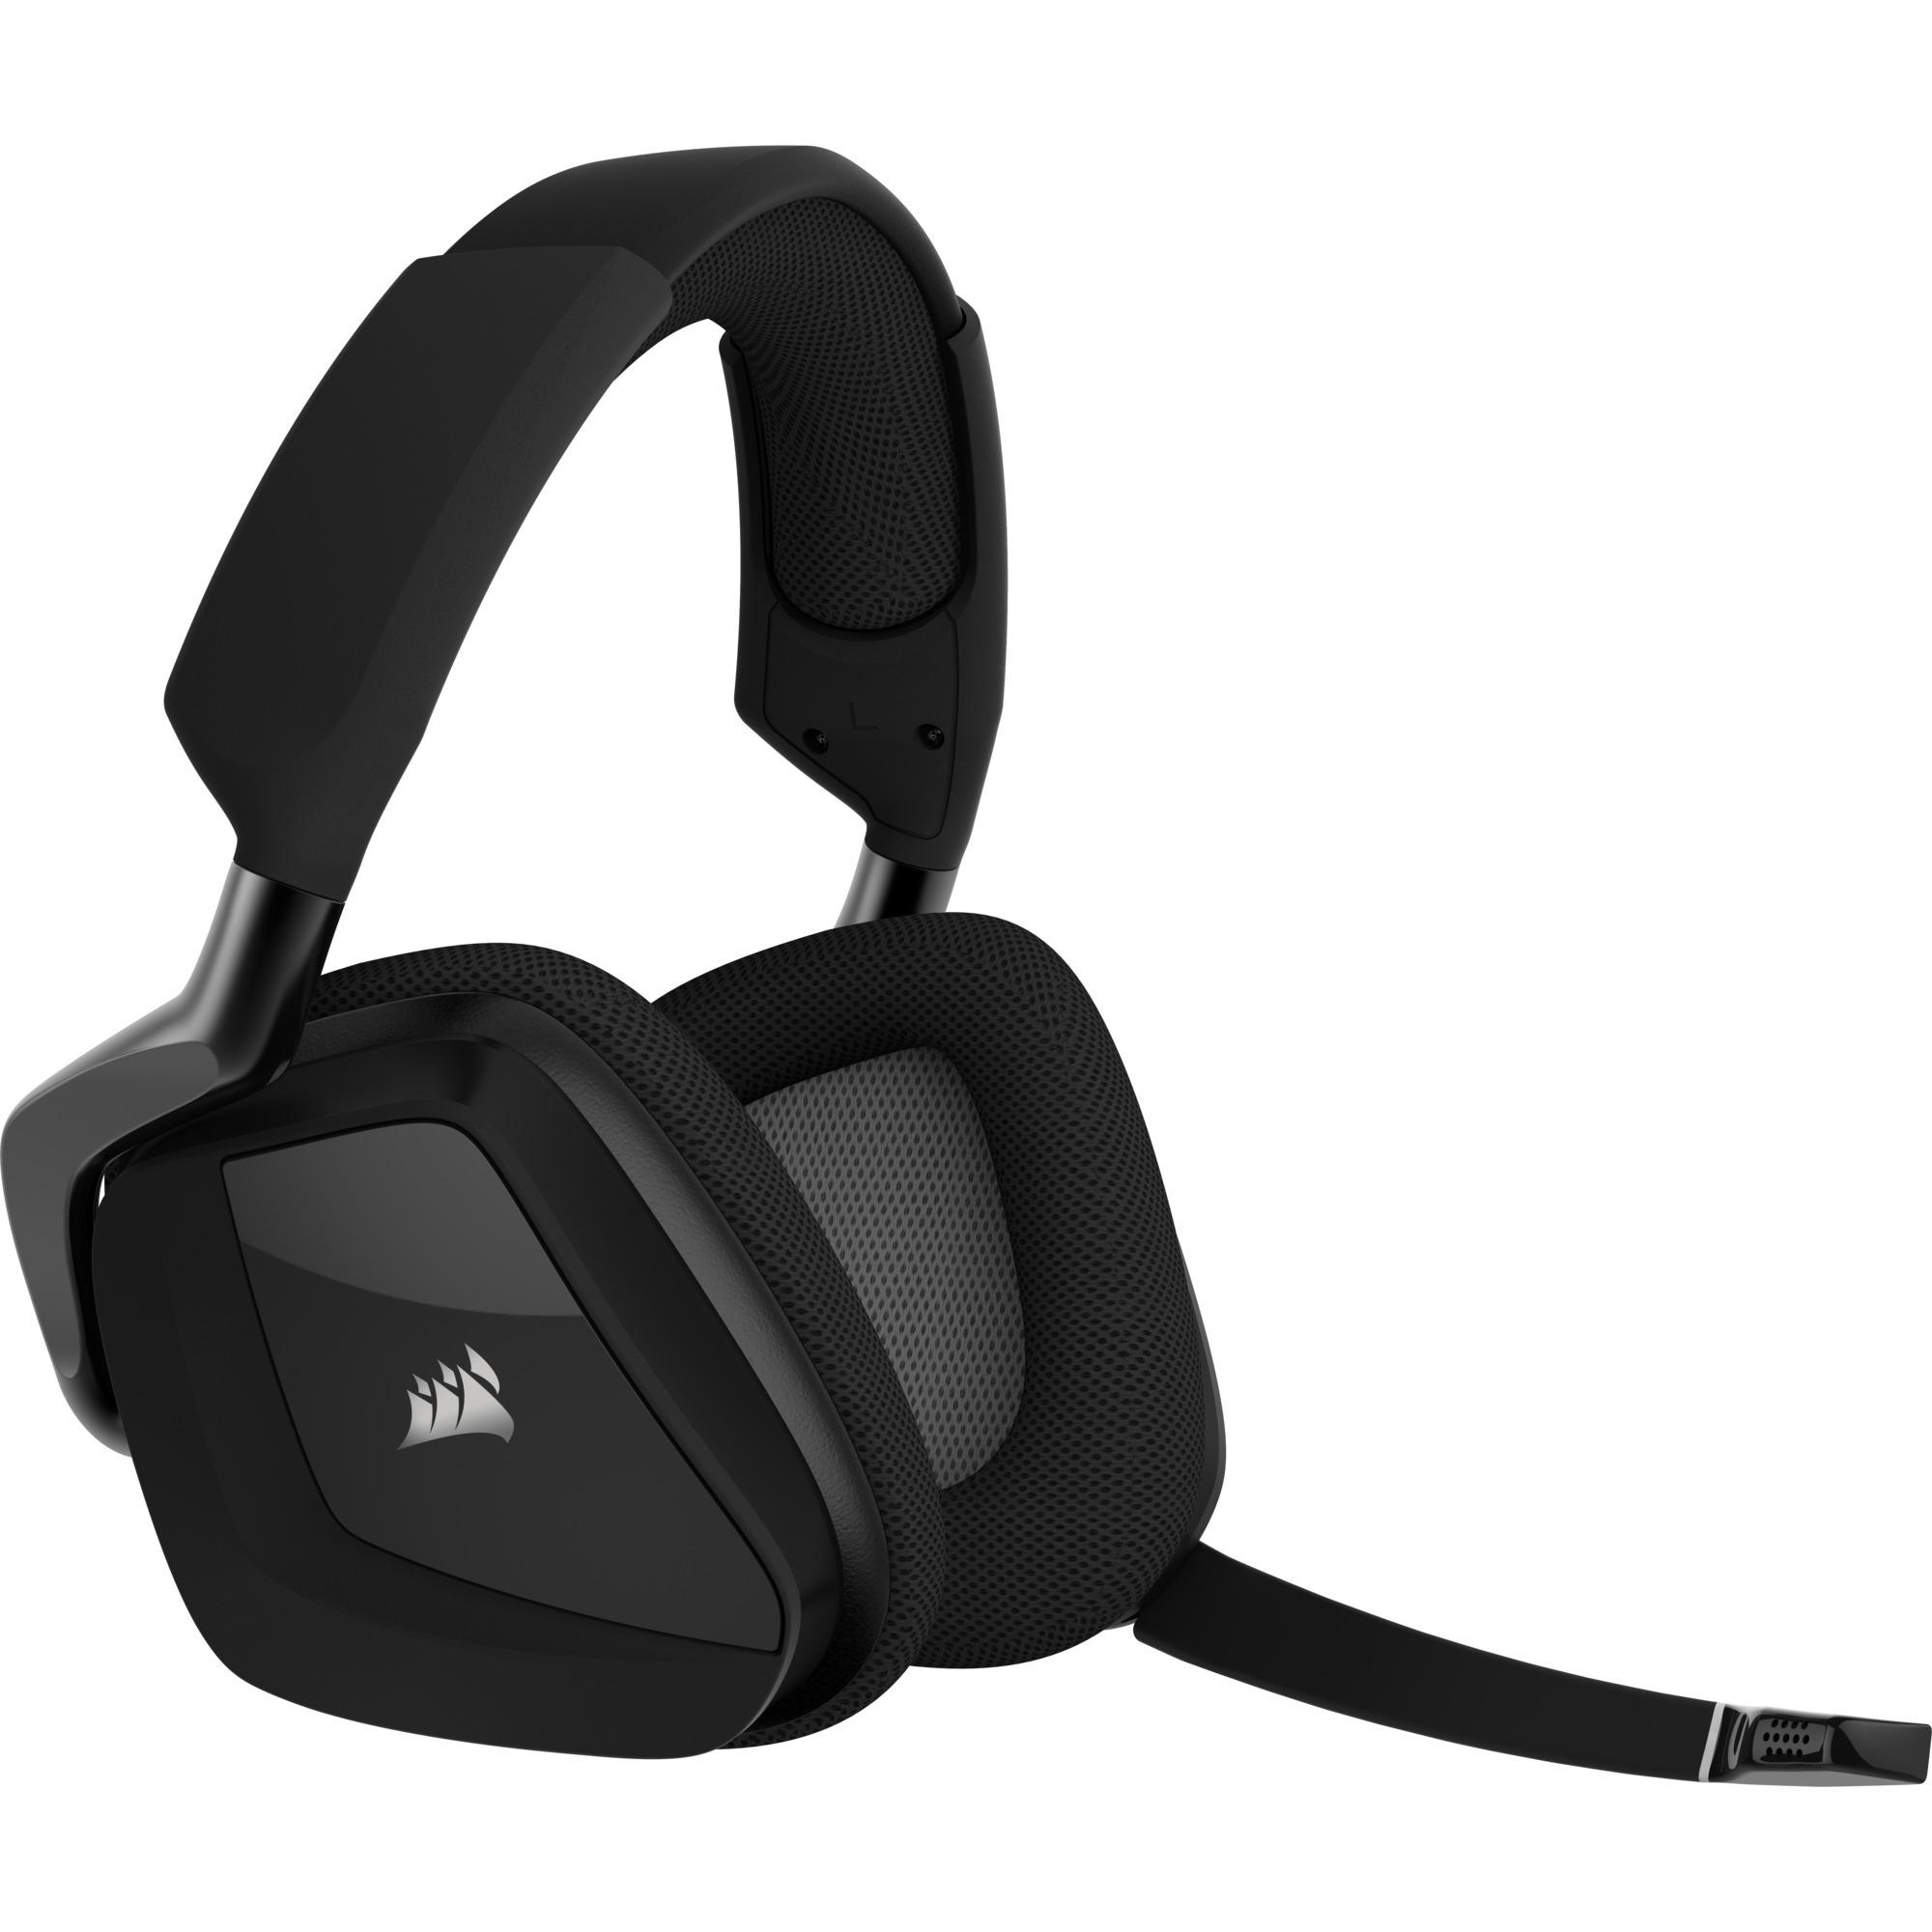 VOID PRO RGB Wireless Premium Binaurale Diadema Carbono auricular con micrófono, Auriculares...